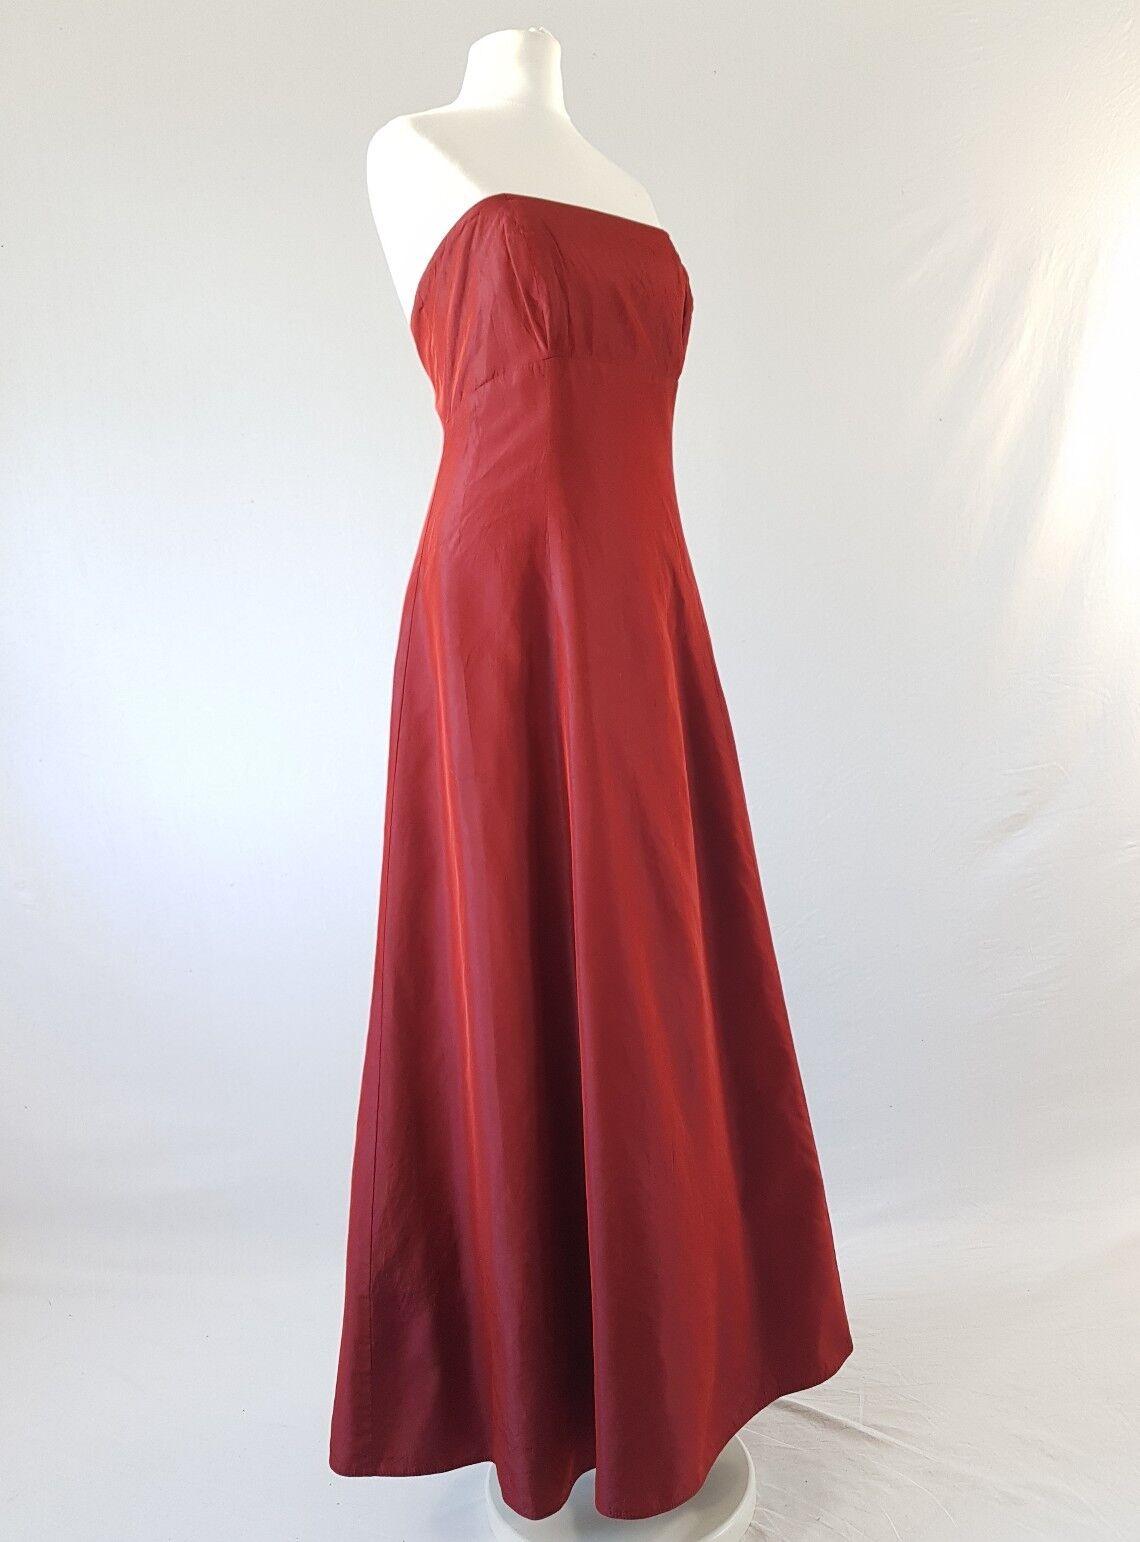 Vintage Prom Dress Strapless Monsoon Style